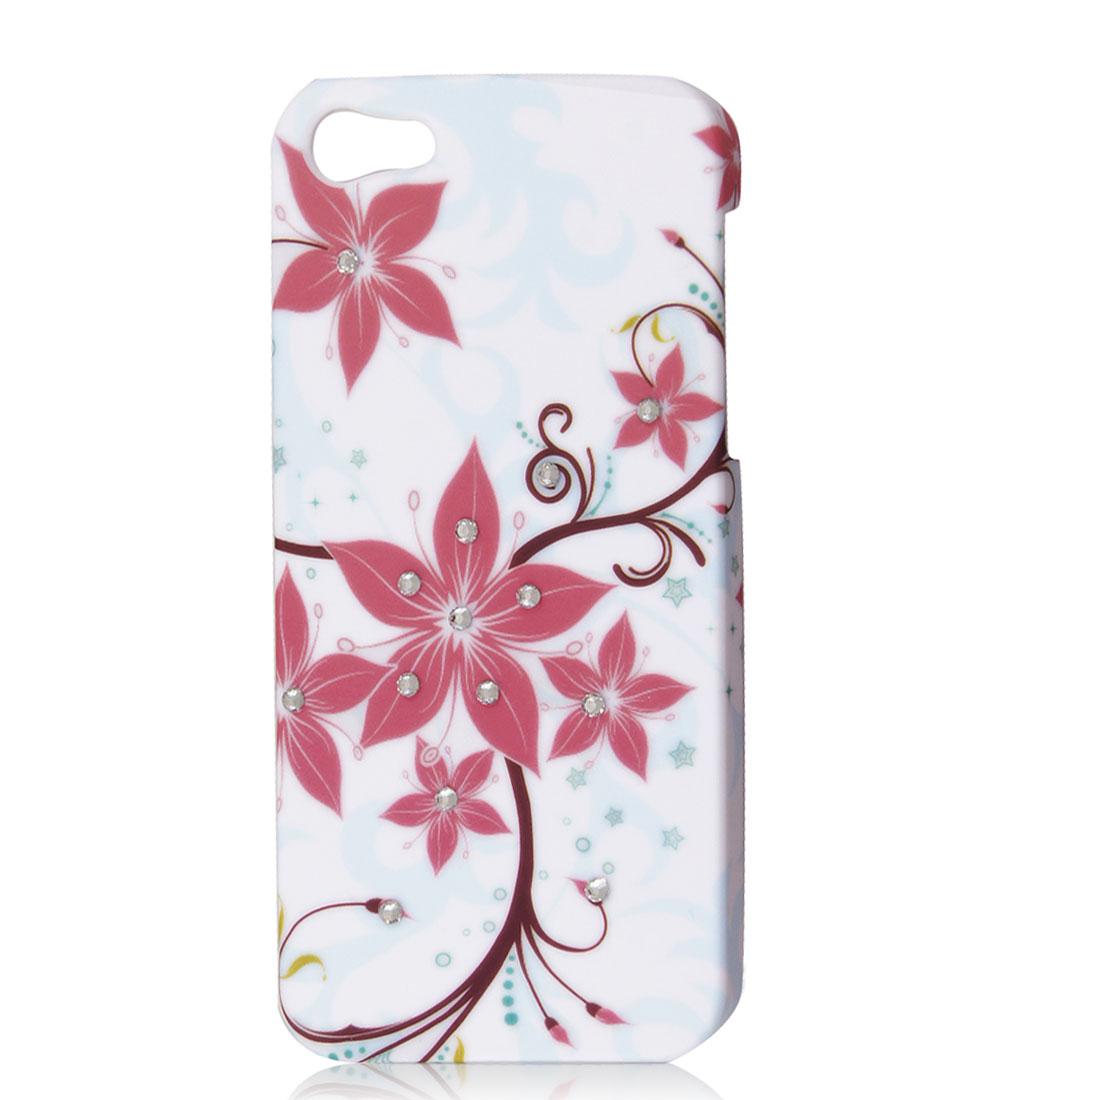 Bling Rhinestone Vine Flower Protective Hard Back Case Cover White for iPhone 5G